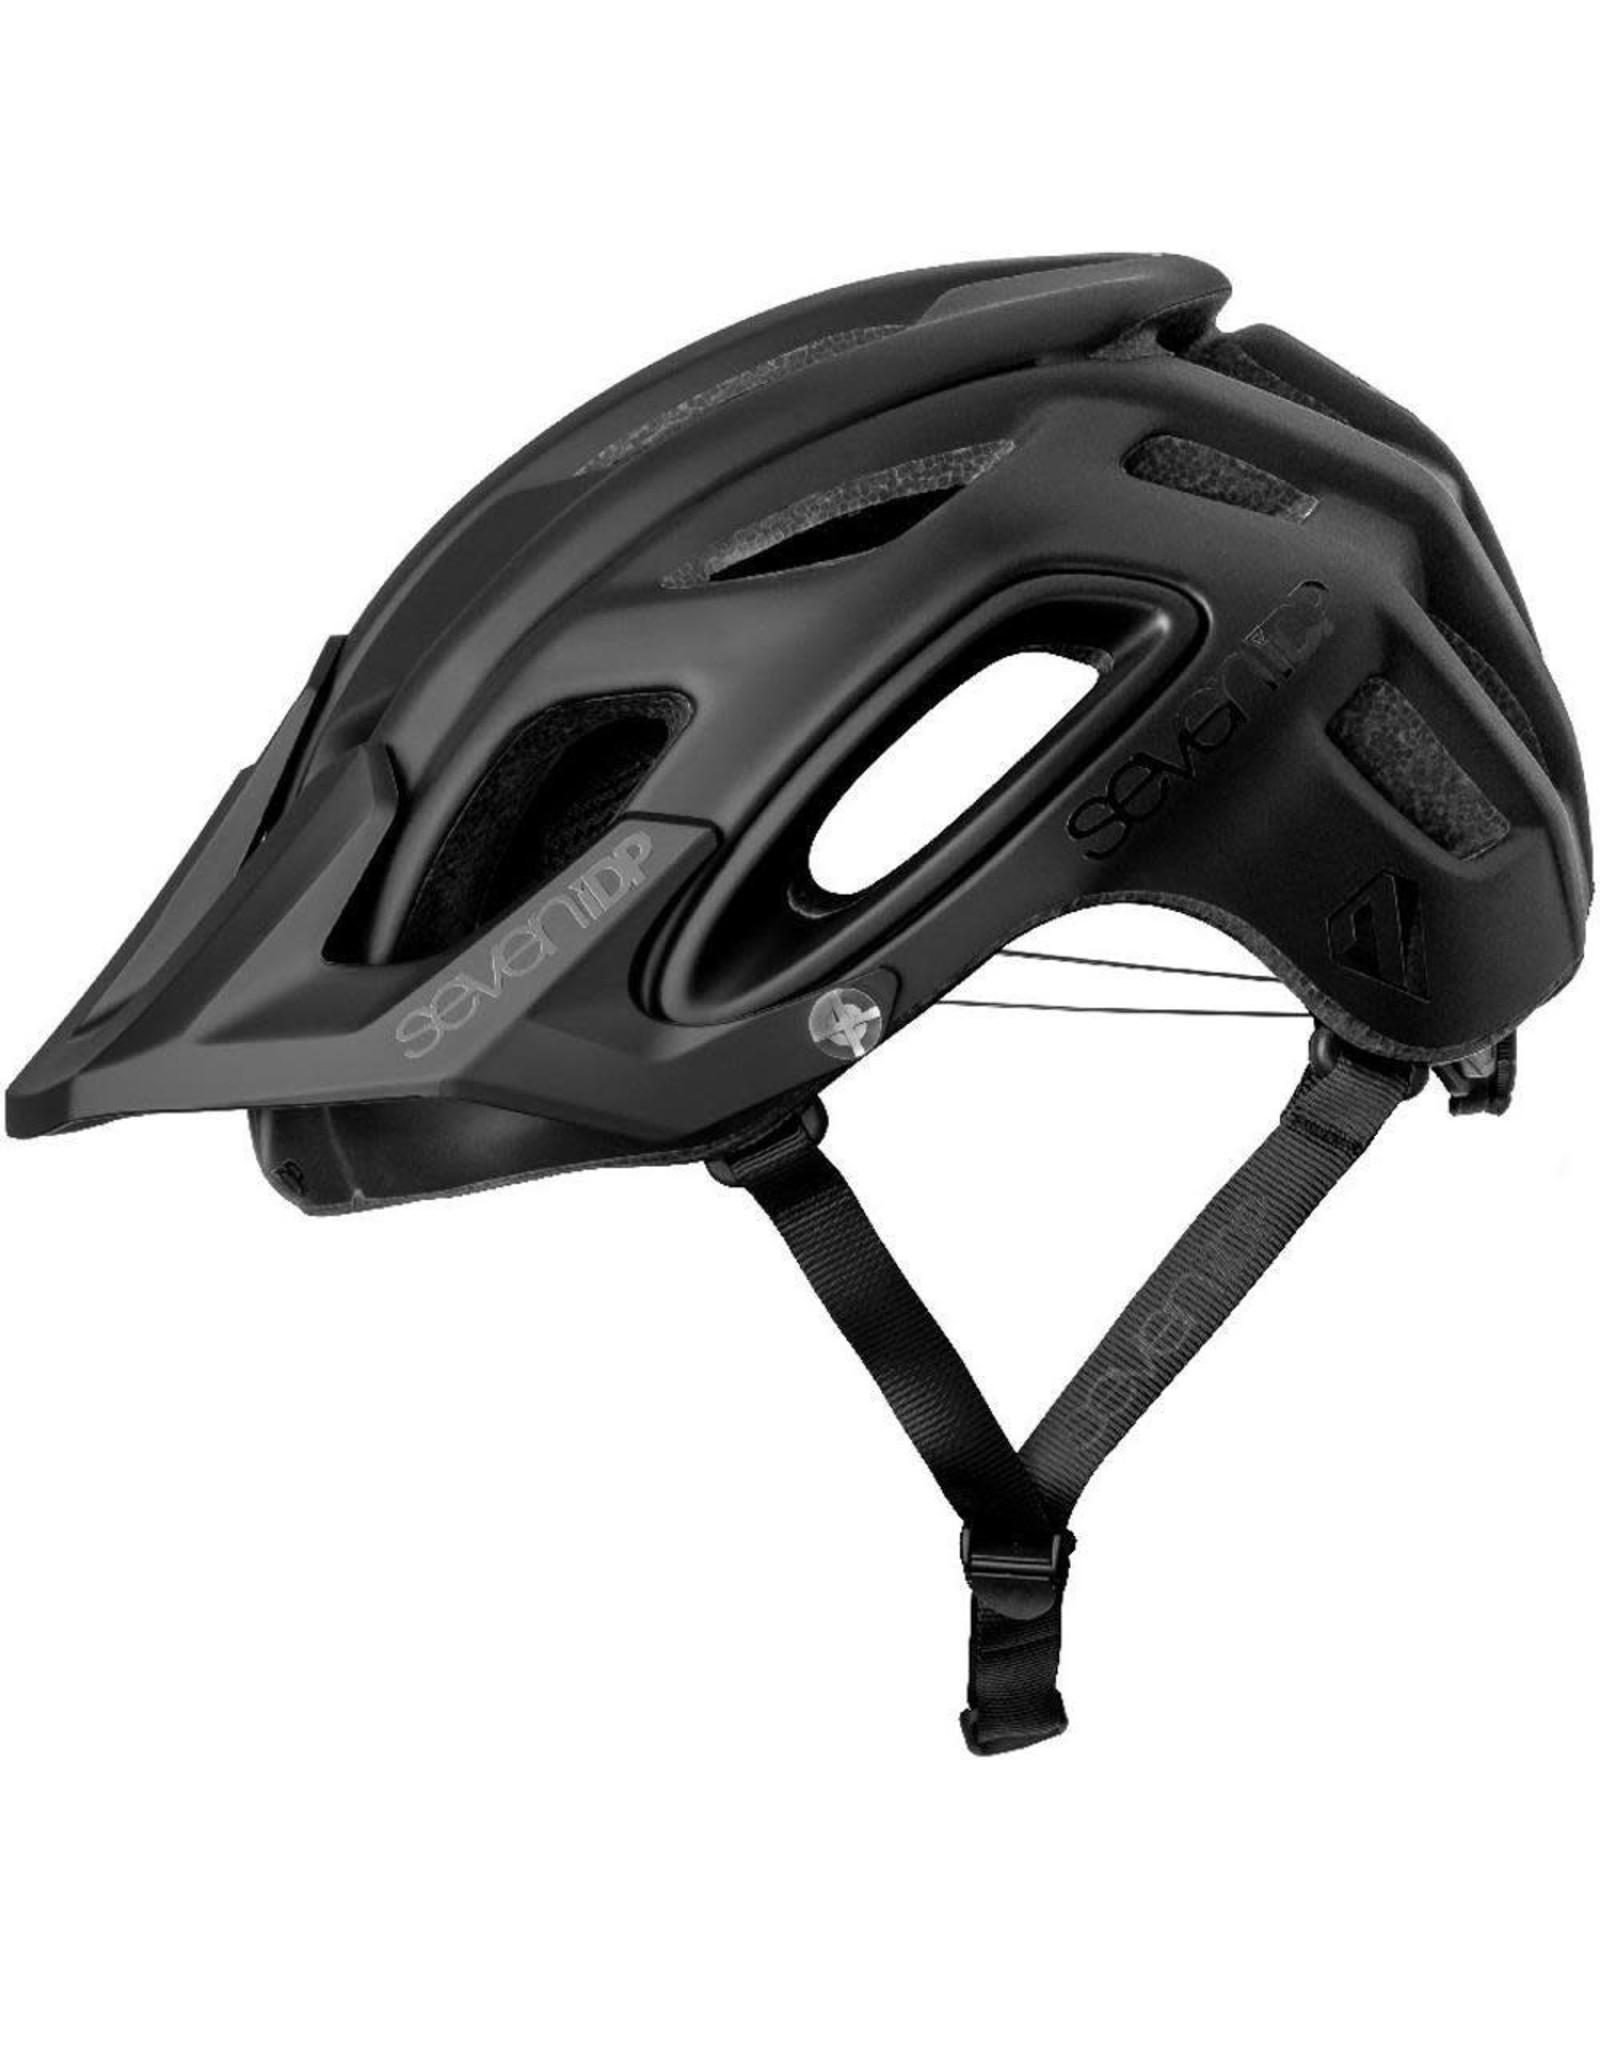 SevenIDP M2 BOA Mountain Bike Helmet